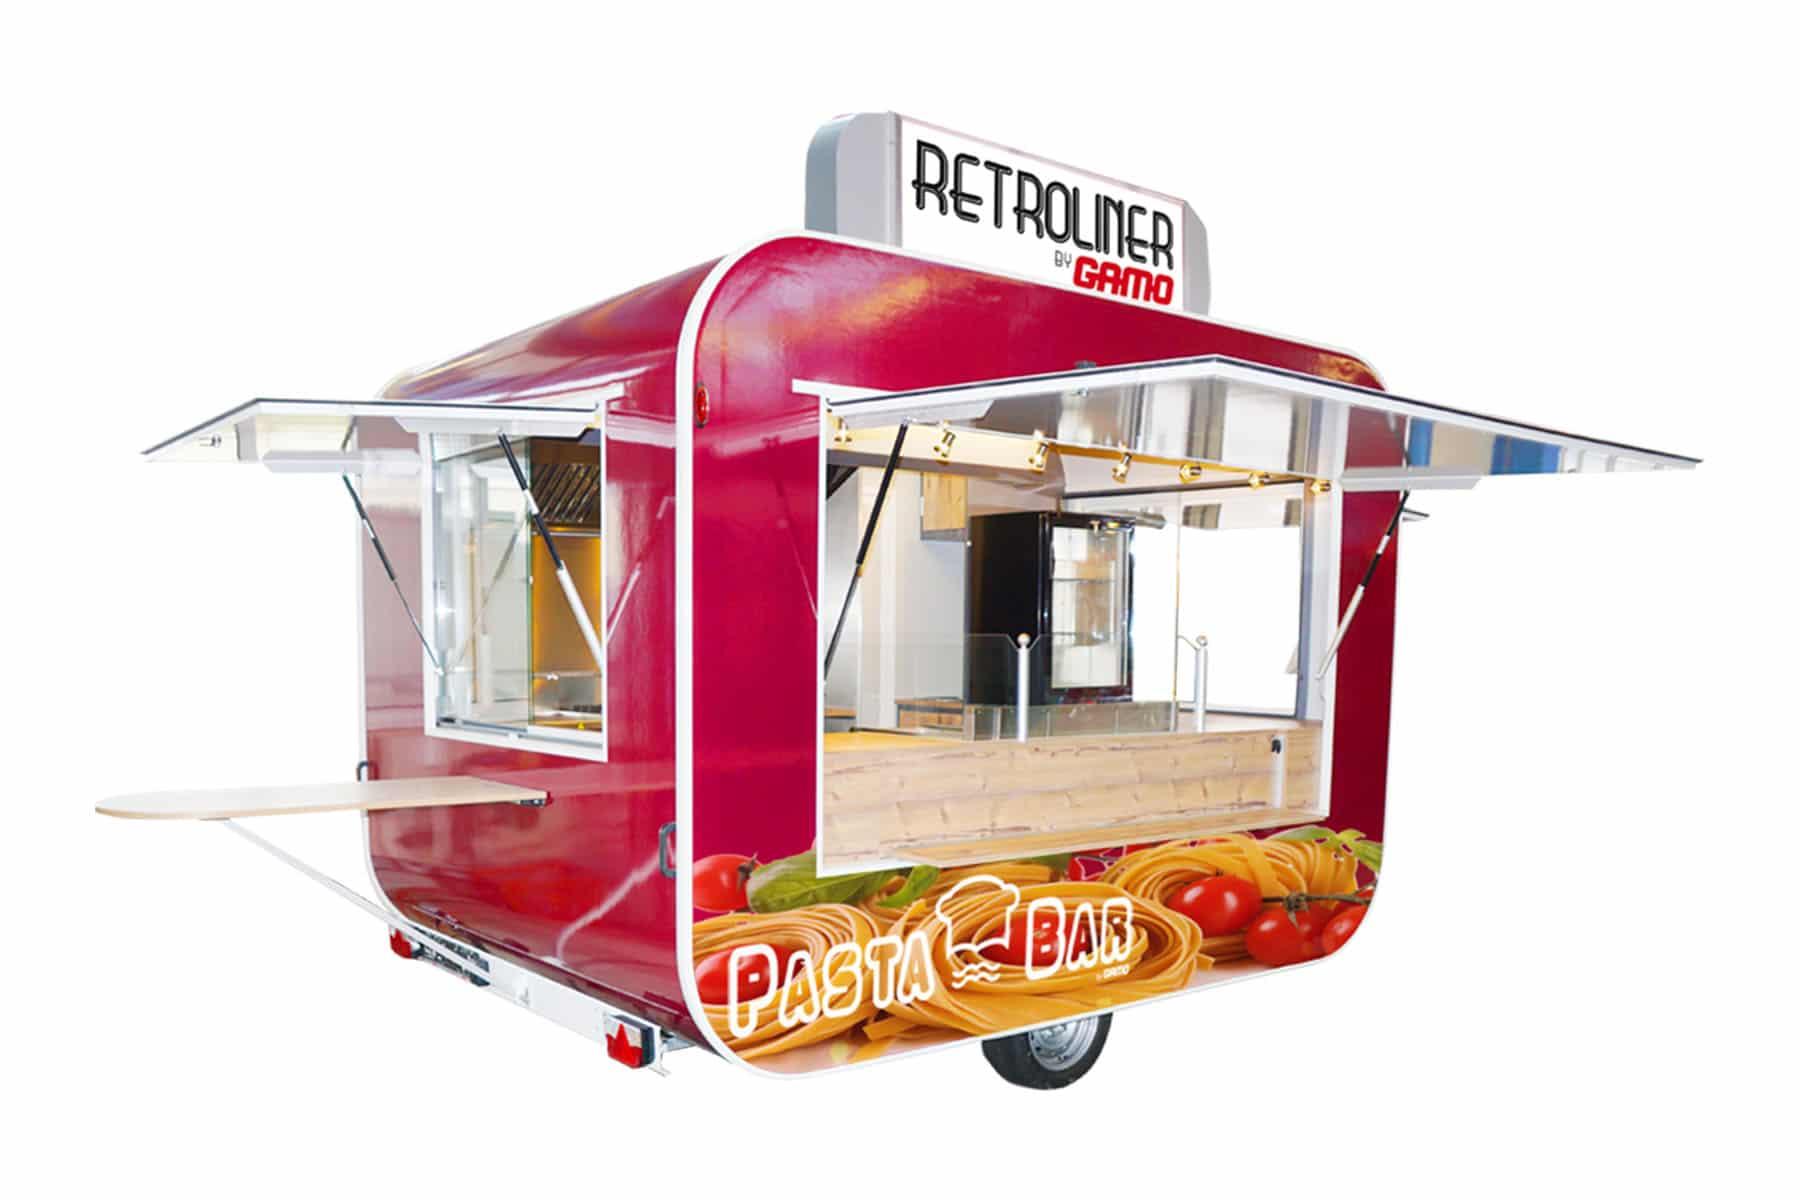 gamo-retroliner-verkaufsanhaenger-verkaufswagen-pasta-nudelbar-imbisswagen-340